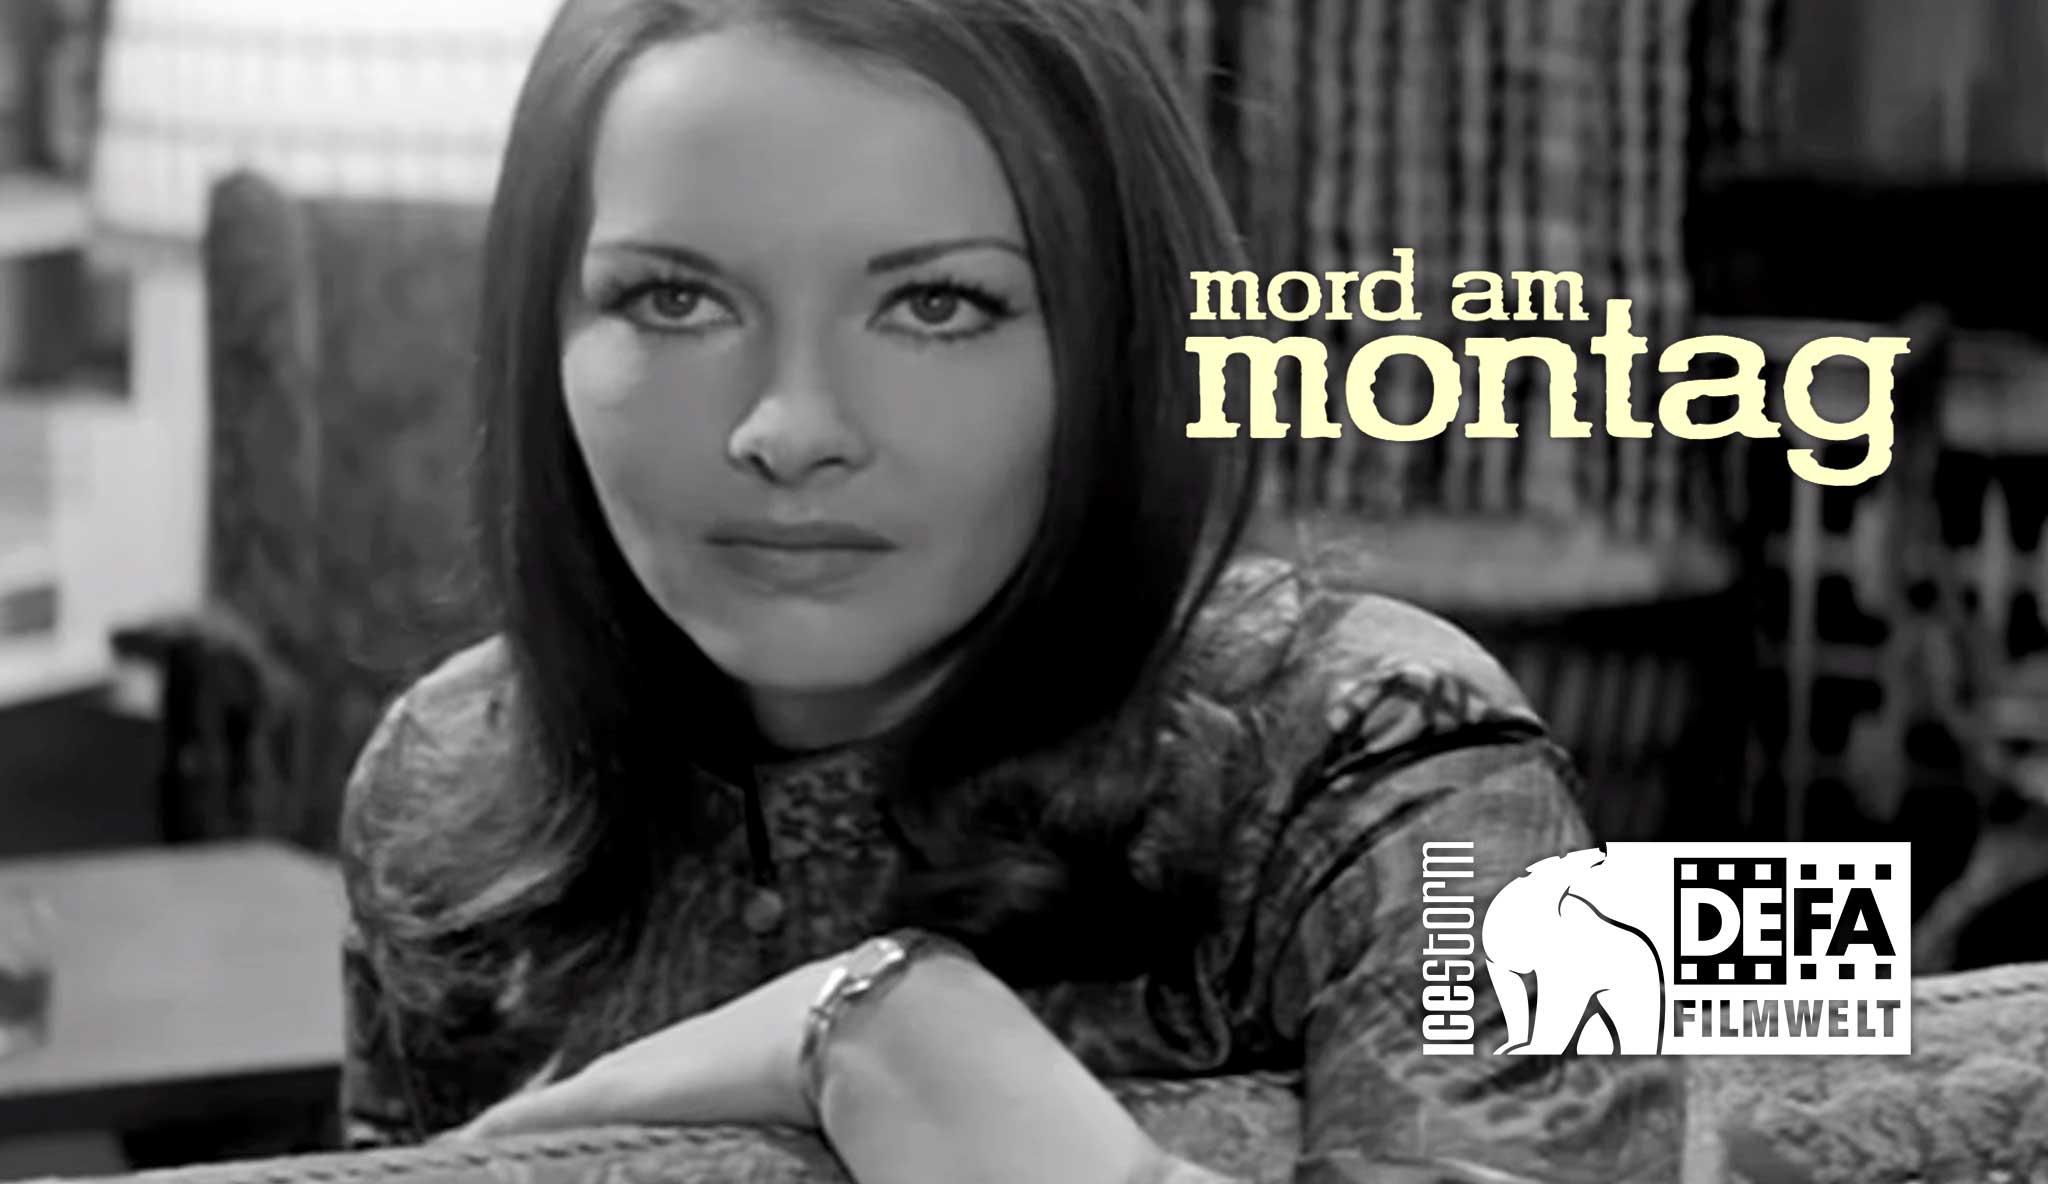 mord-am-montag\header.jpg